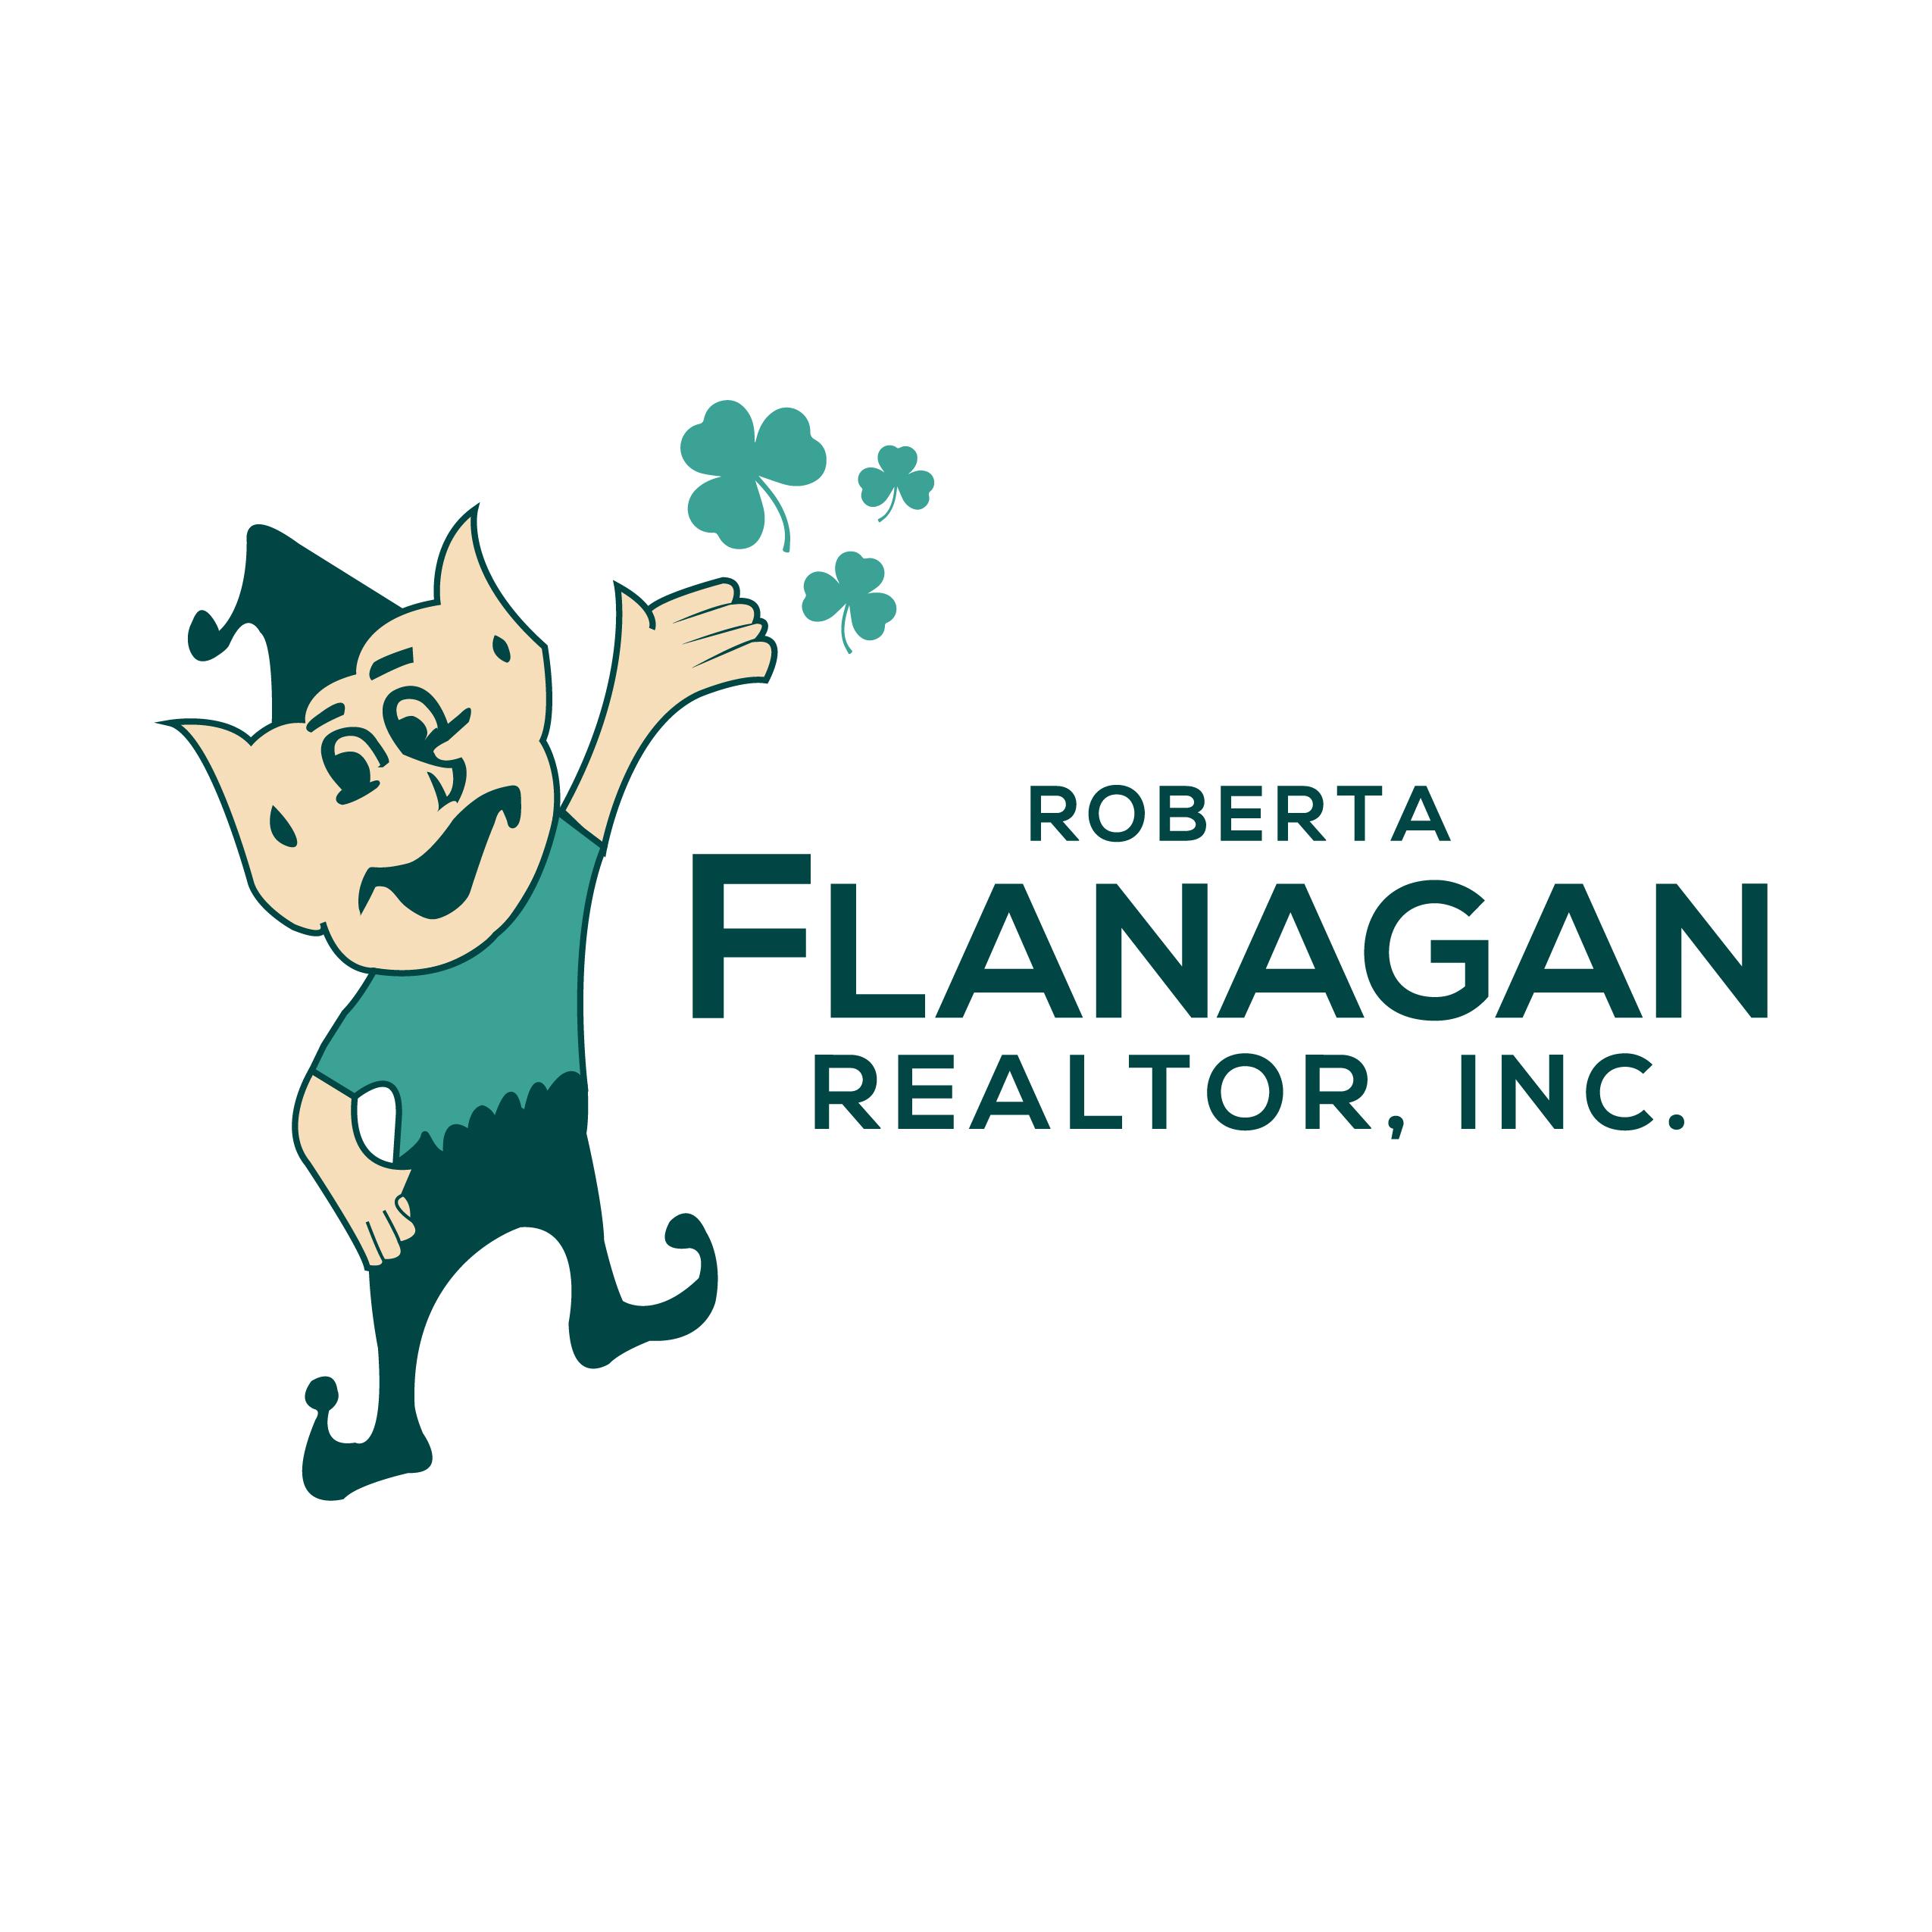 Flanagan Realtor Logo